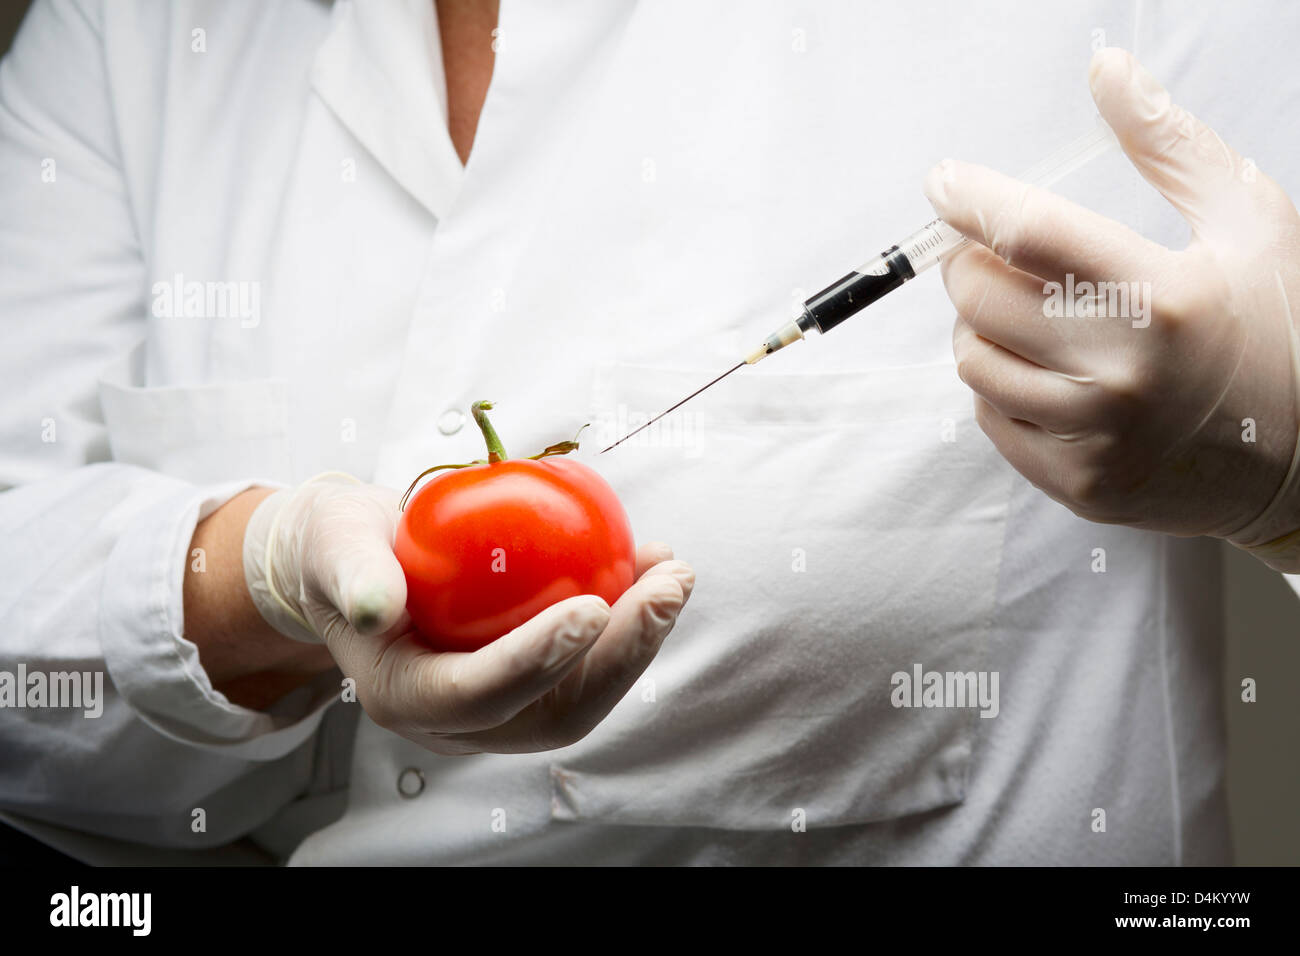 Scientist injecting tomato with syringe - Stock Image